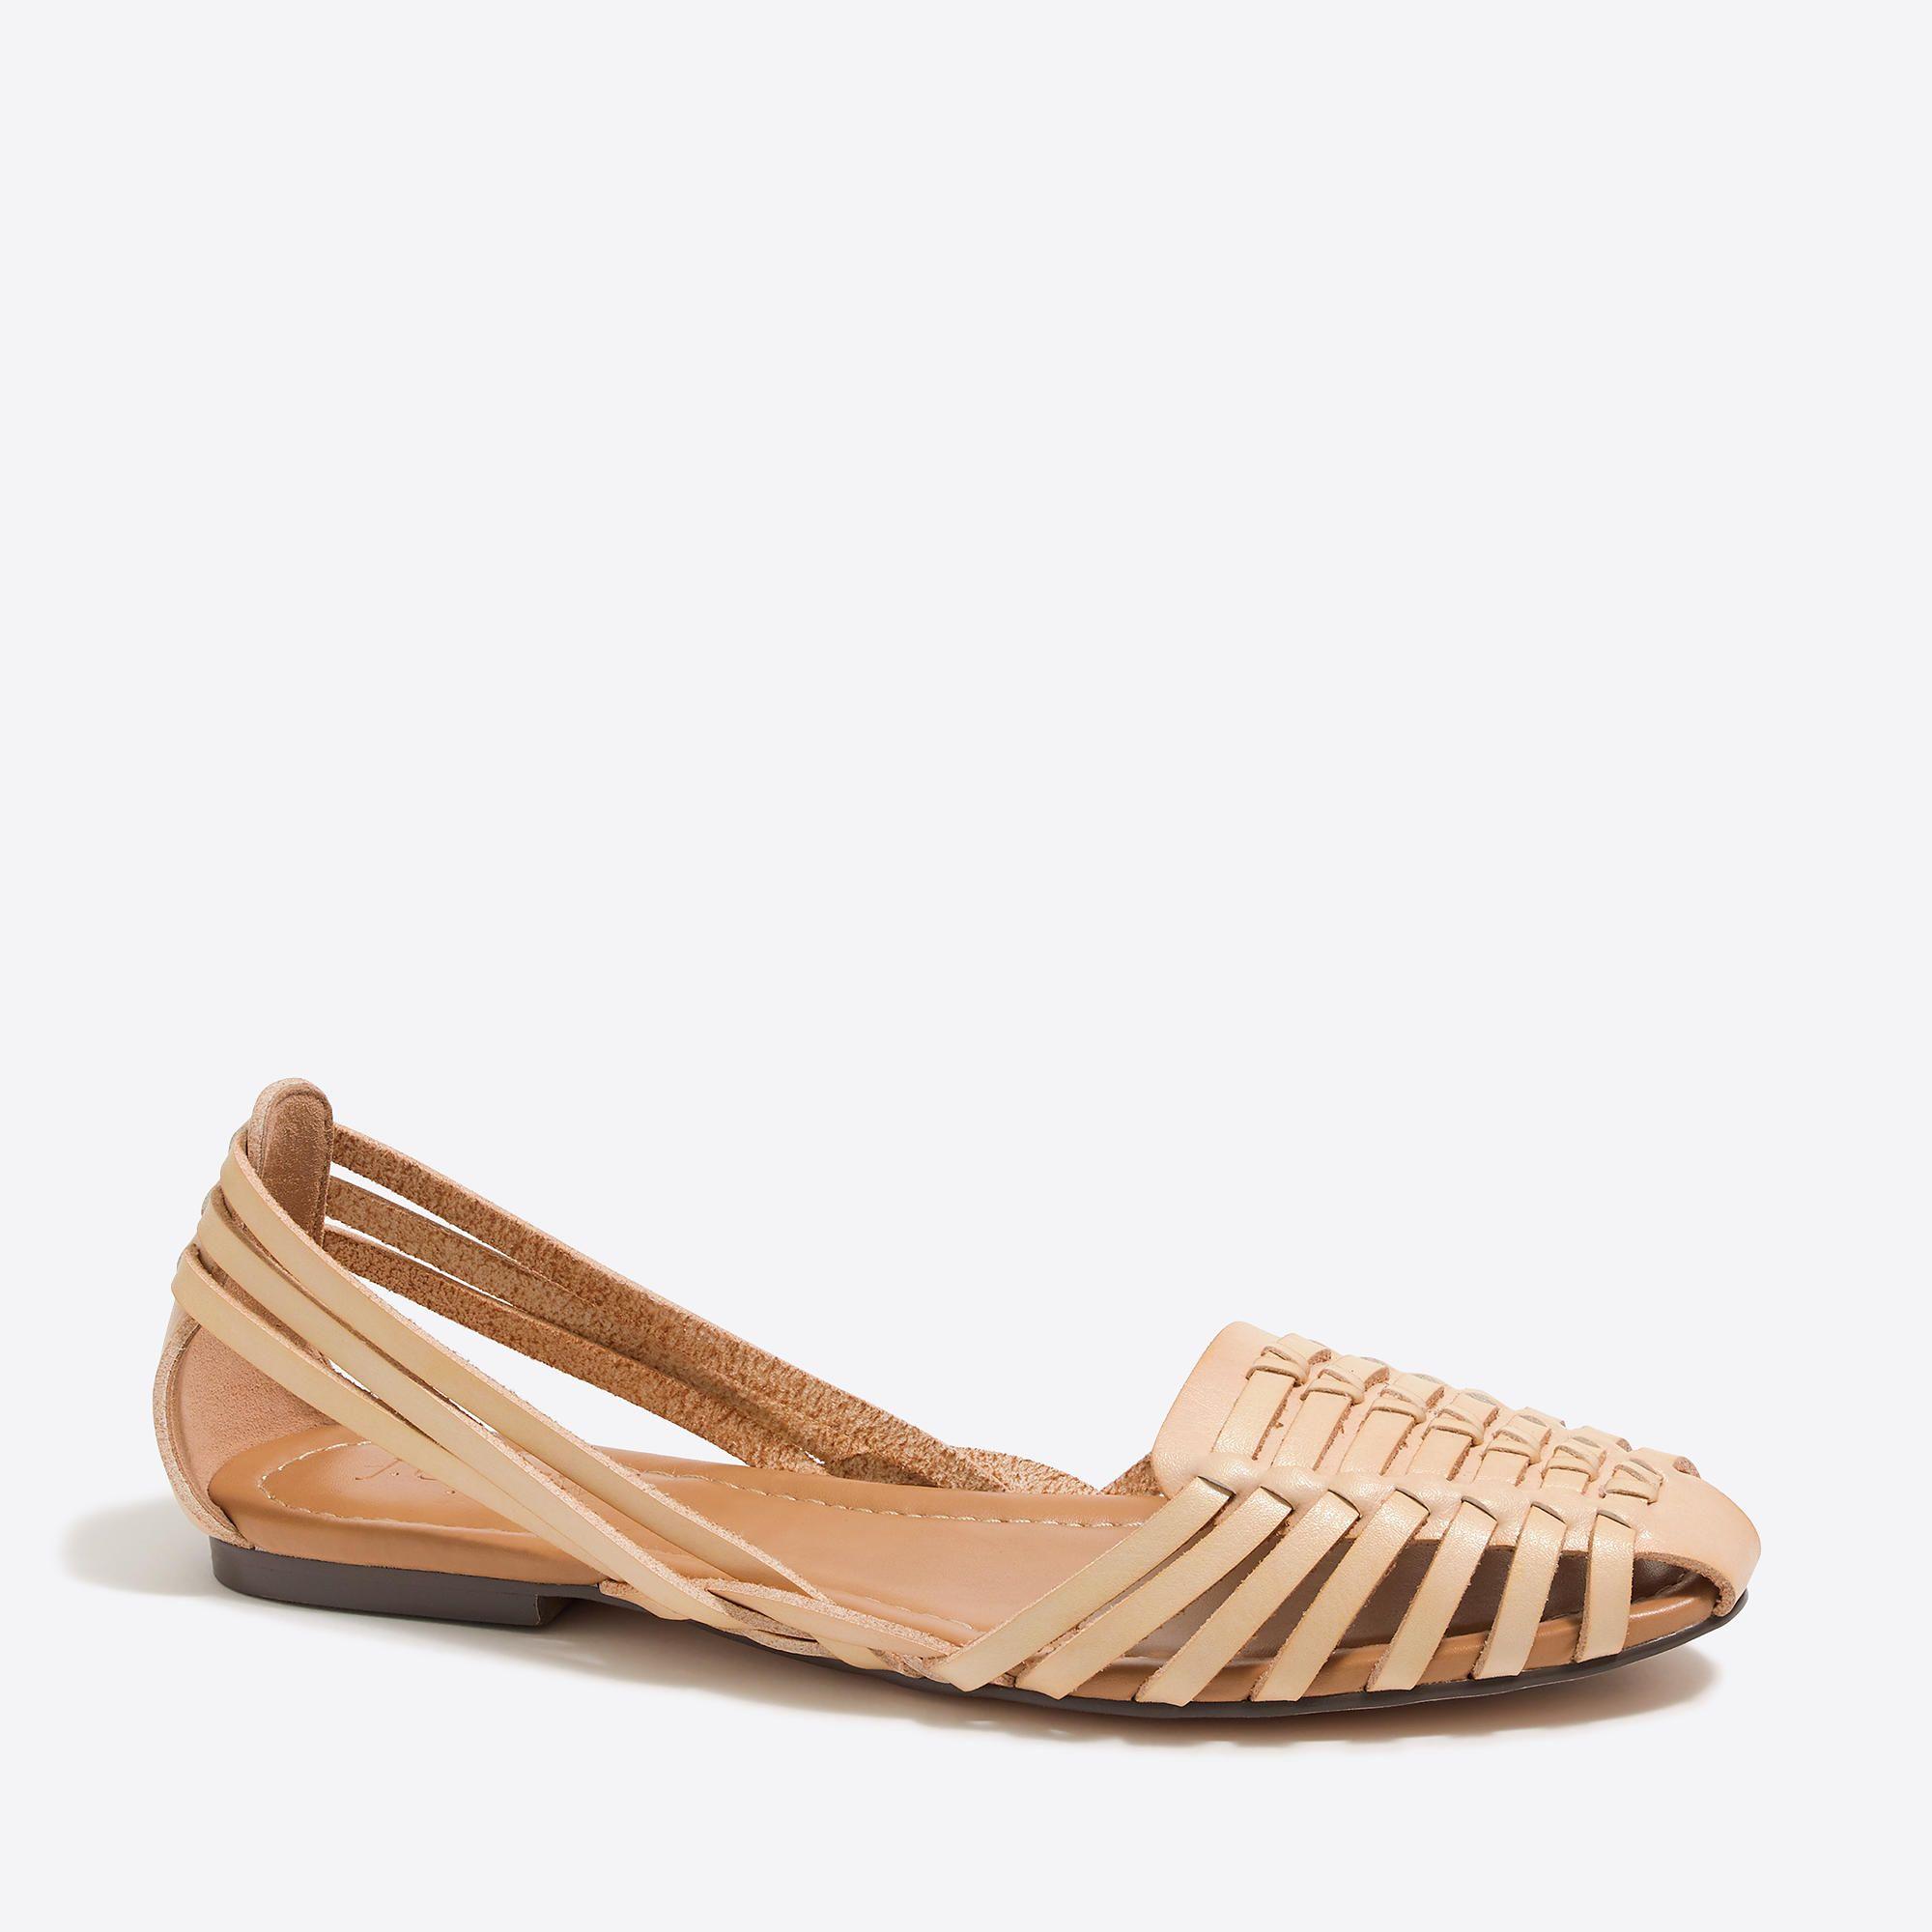 J.Crew - Huarache sandals